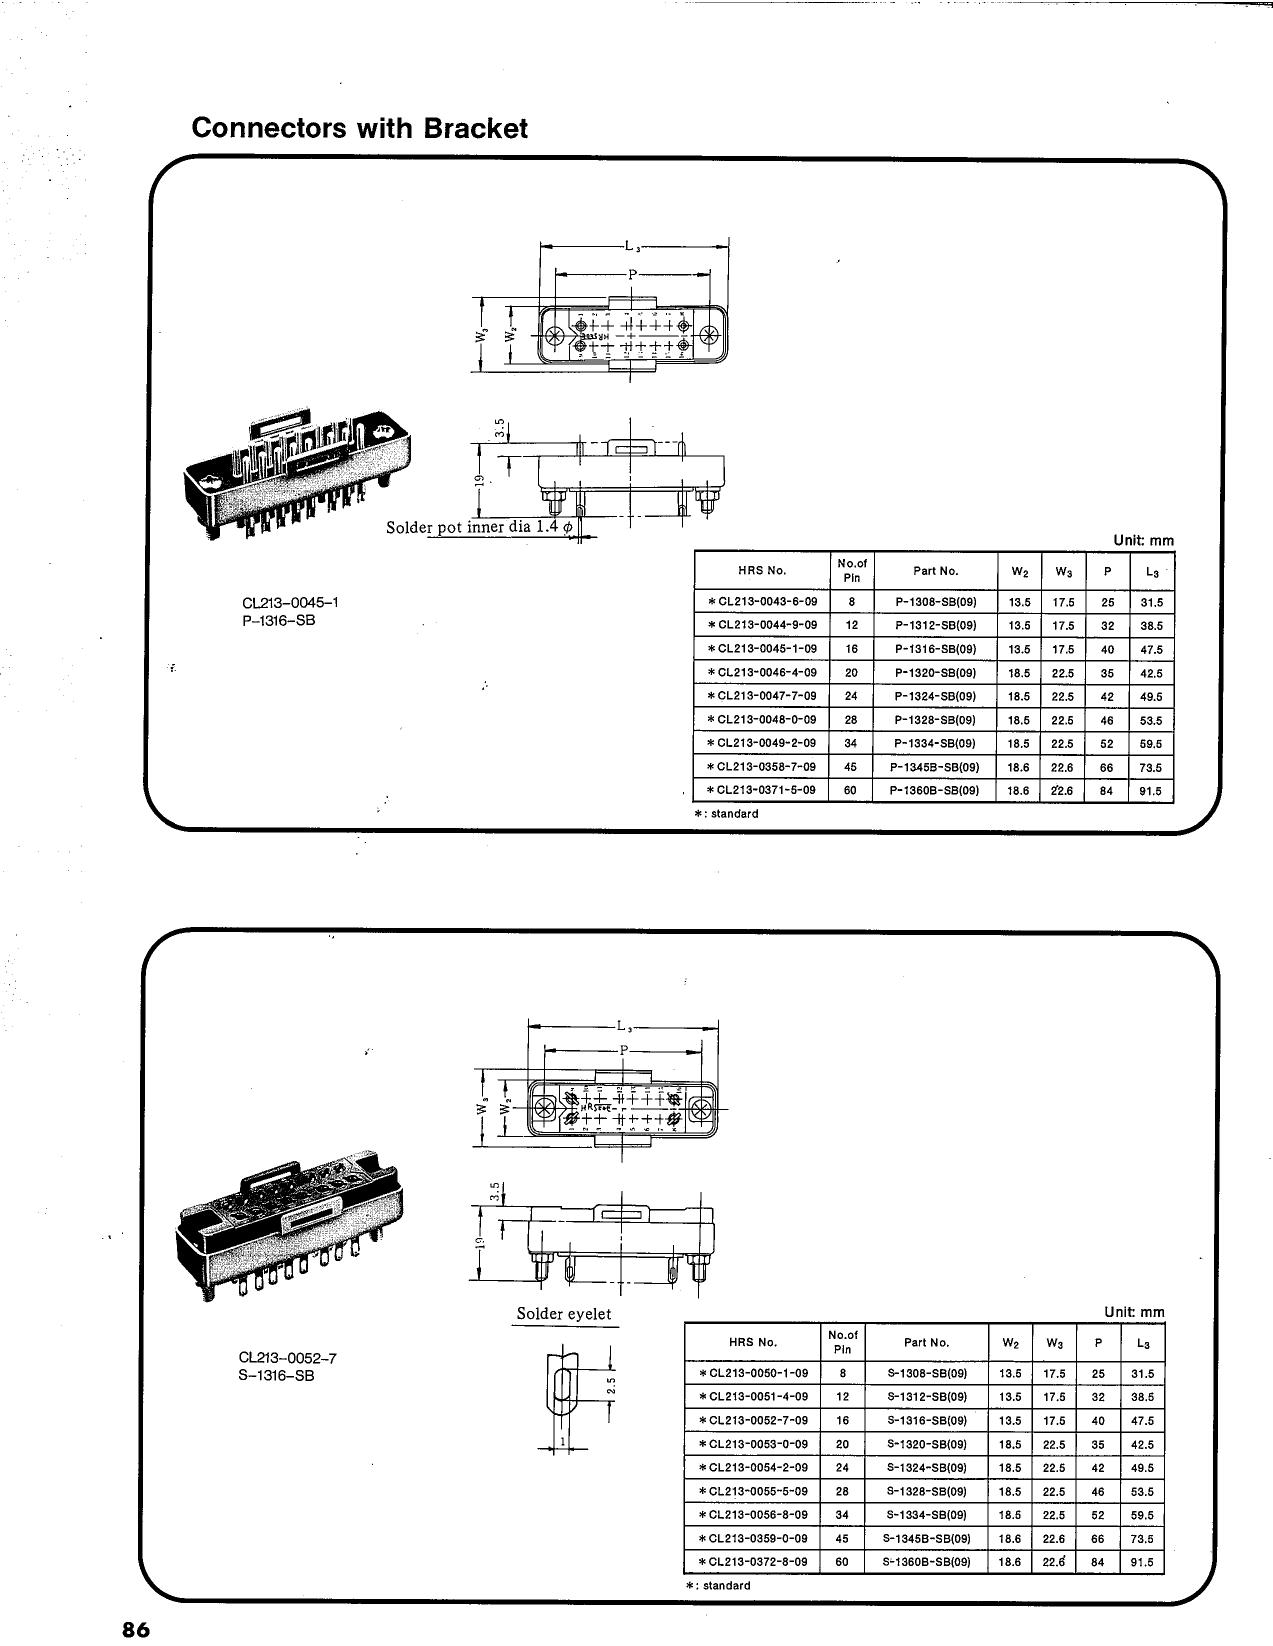 S-138-CT pdf